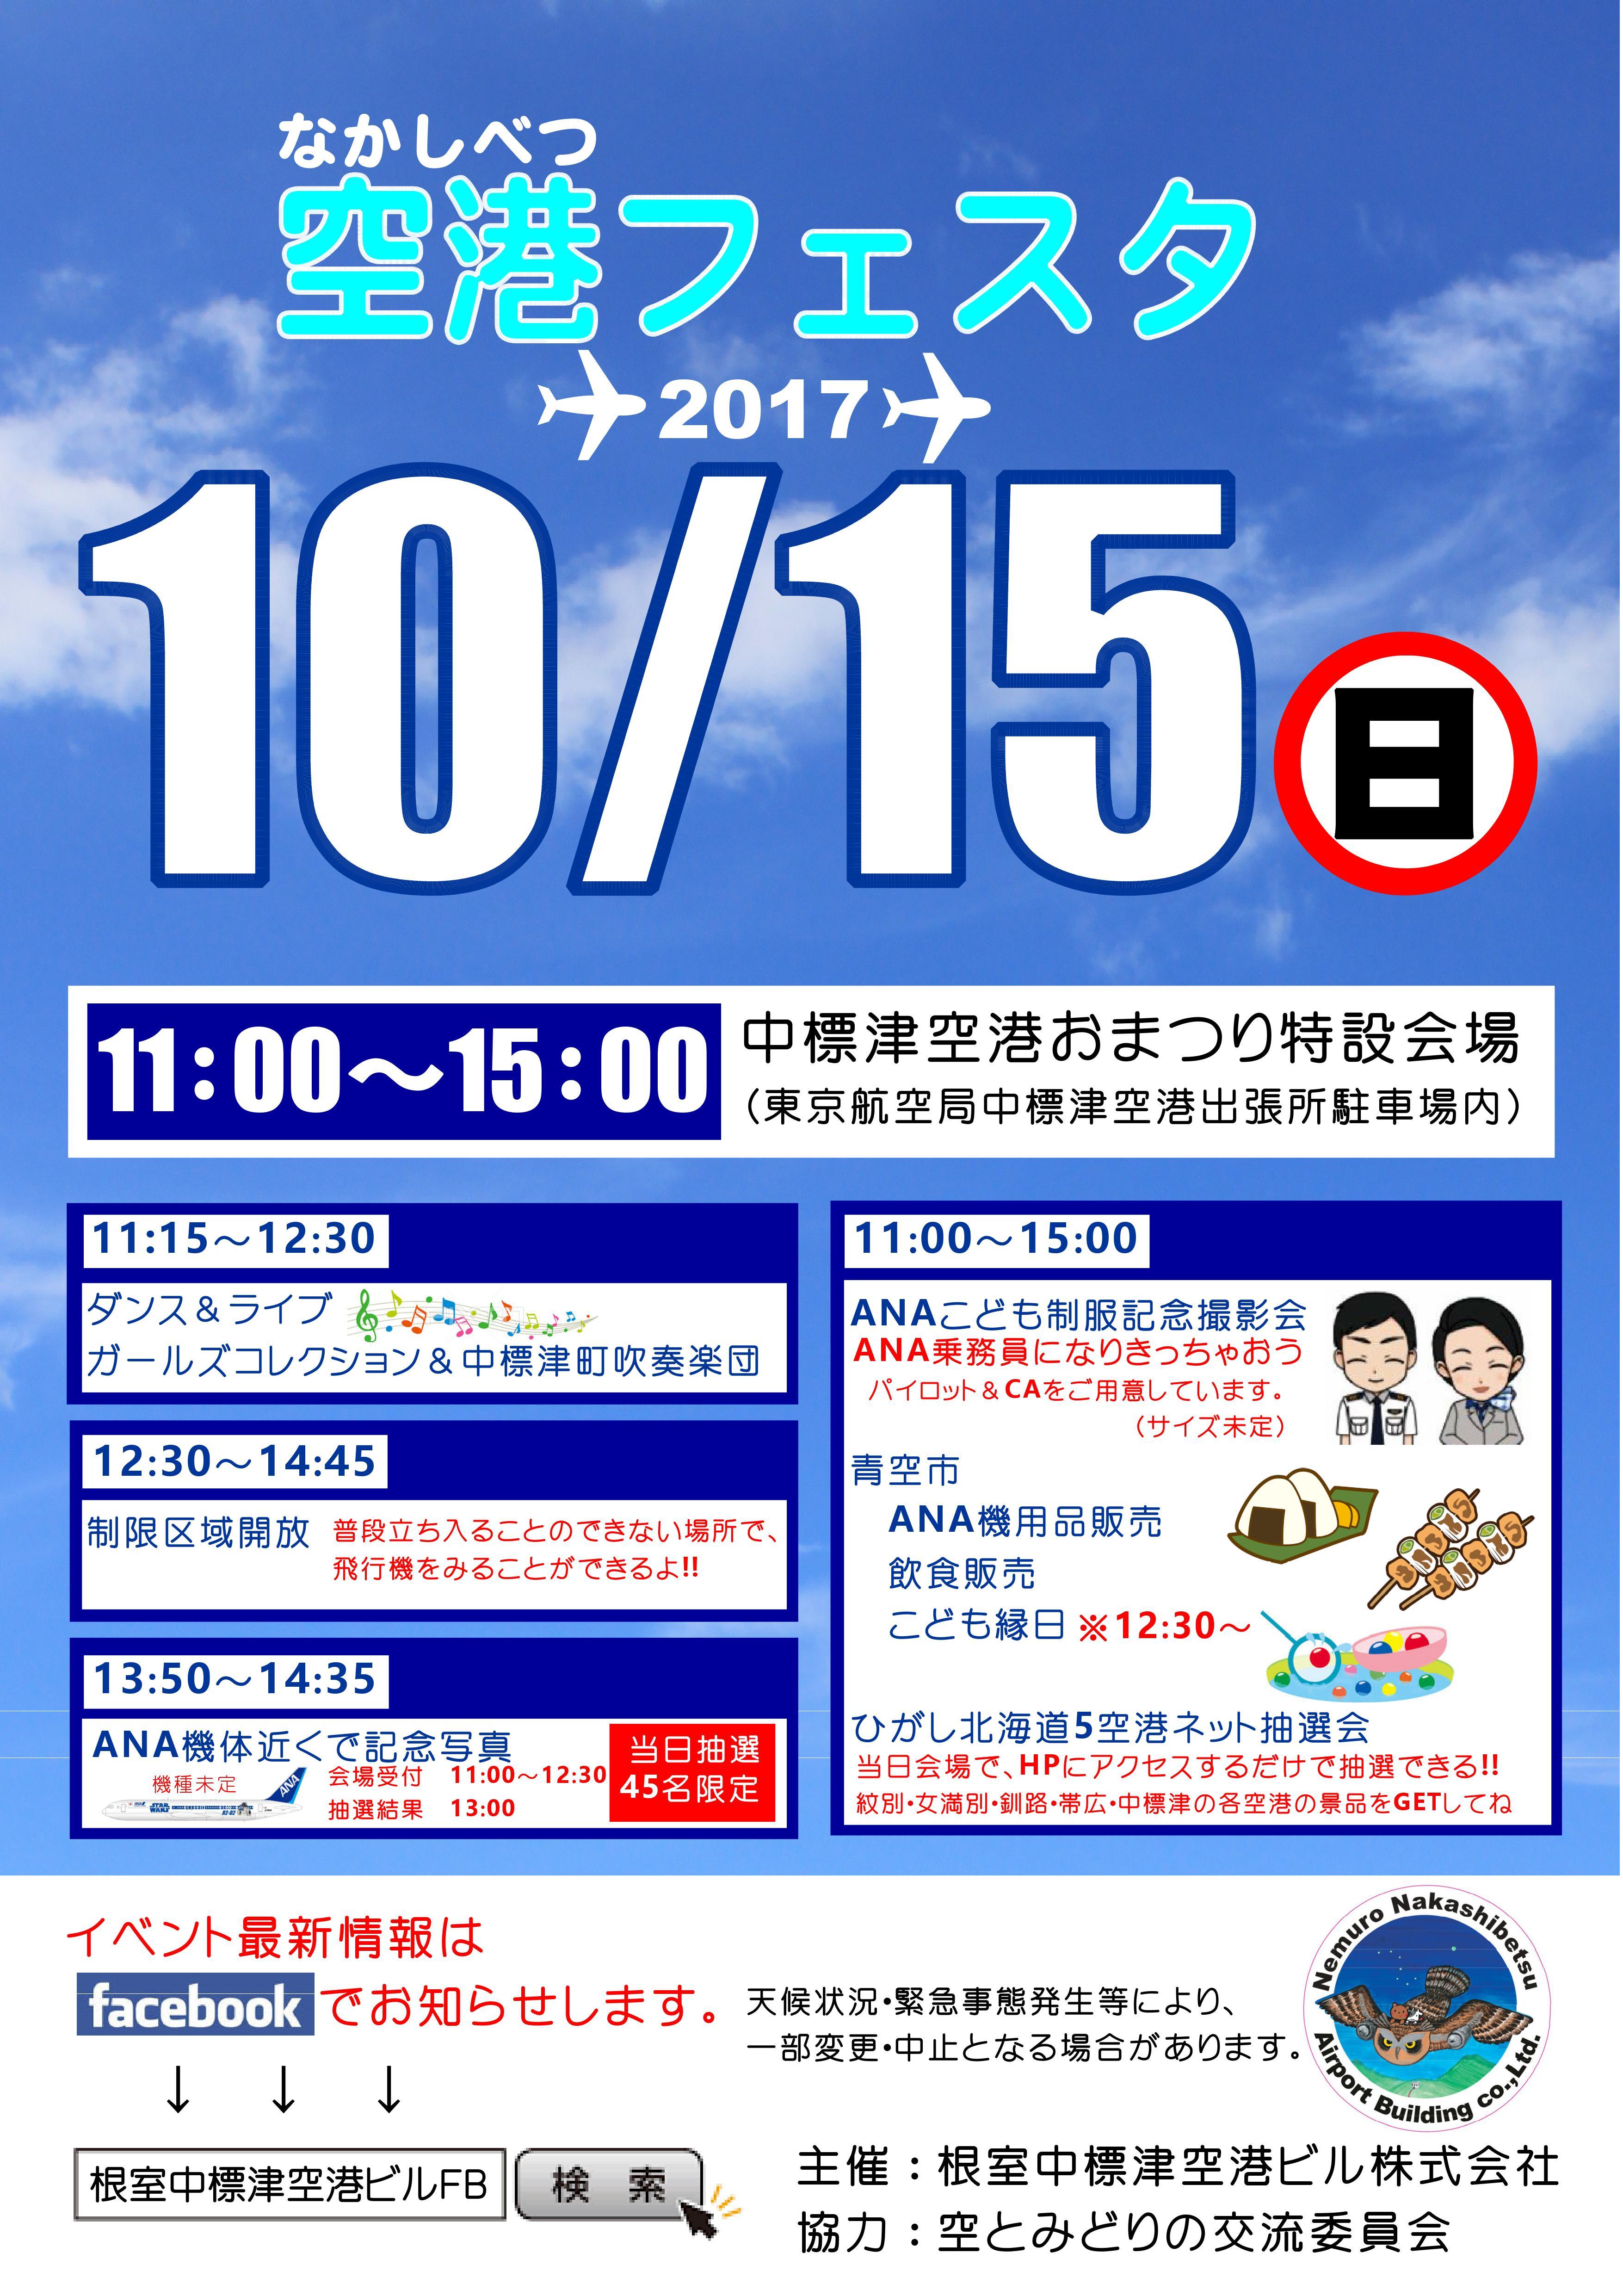 http://www.nakashibetsu-airport.jp/%E7%A9%BA%E6%B8%AF%EF%BE%8C%EF%BD%AA%EF%BD%BD%EF%BE%802017.jpg